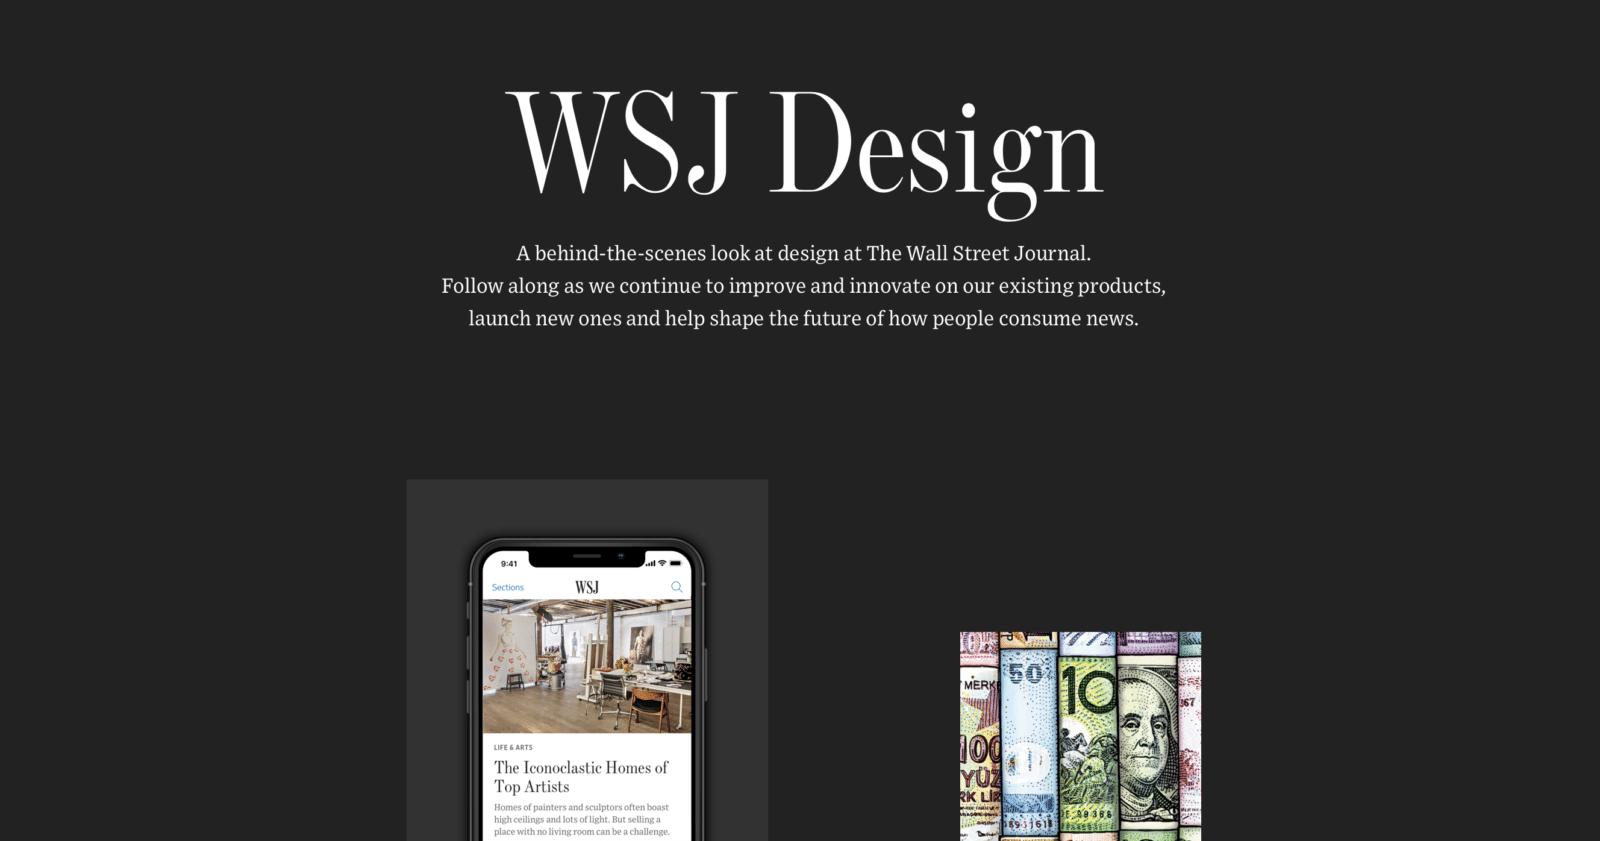 WSJ เปิดหน้าเว็บ โชว์เบื้องหลังการออกแบบเว็บและแอพข่าว